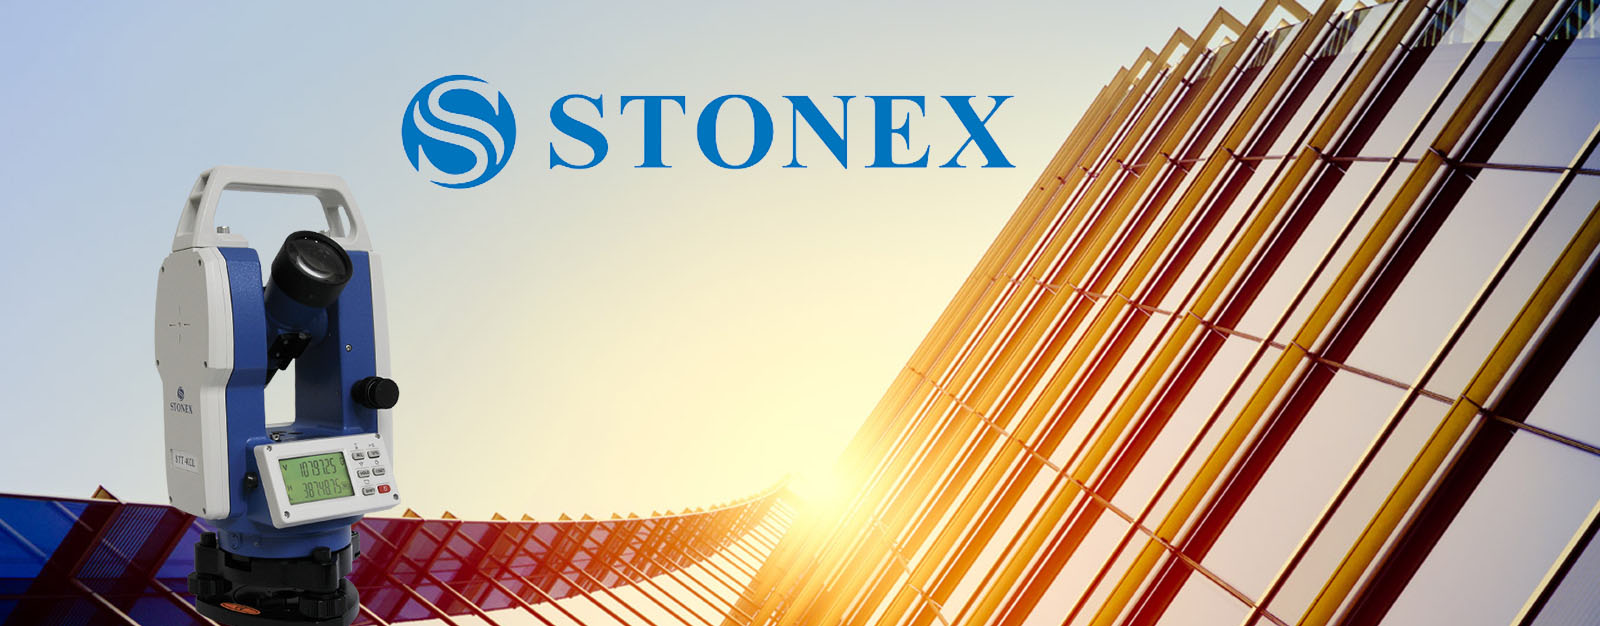 stonex-teodolit